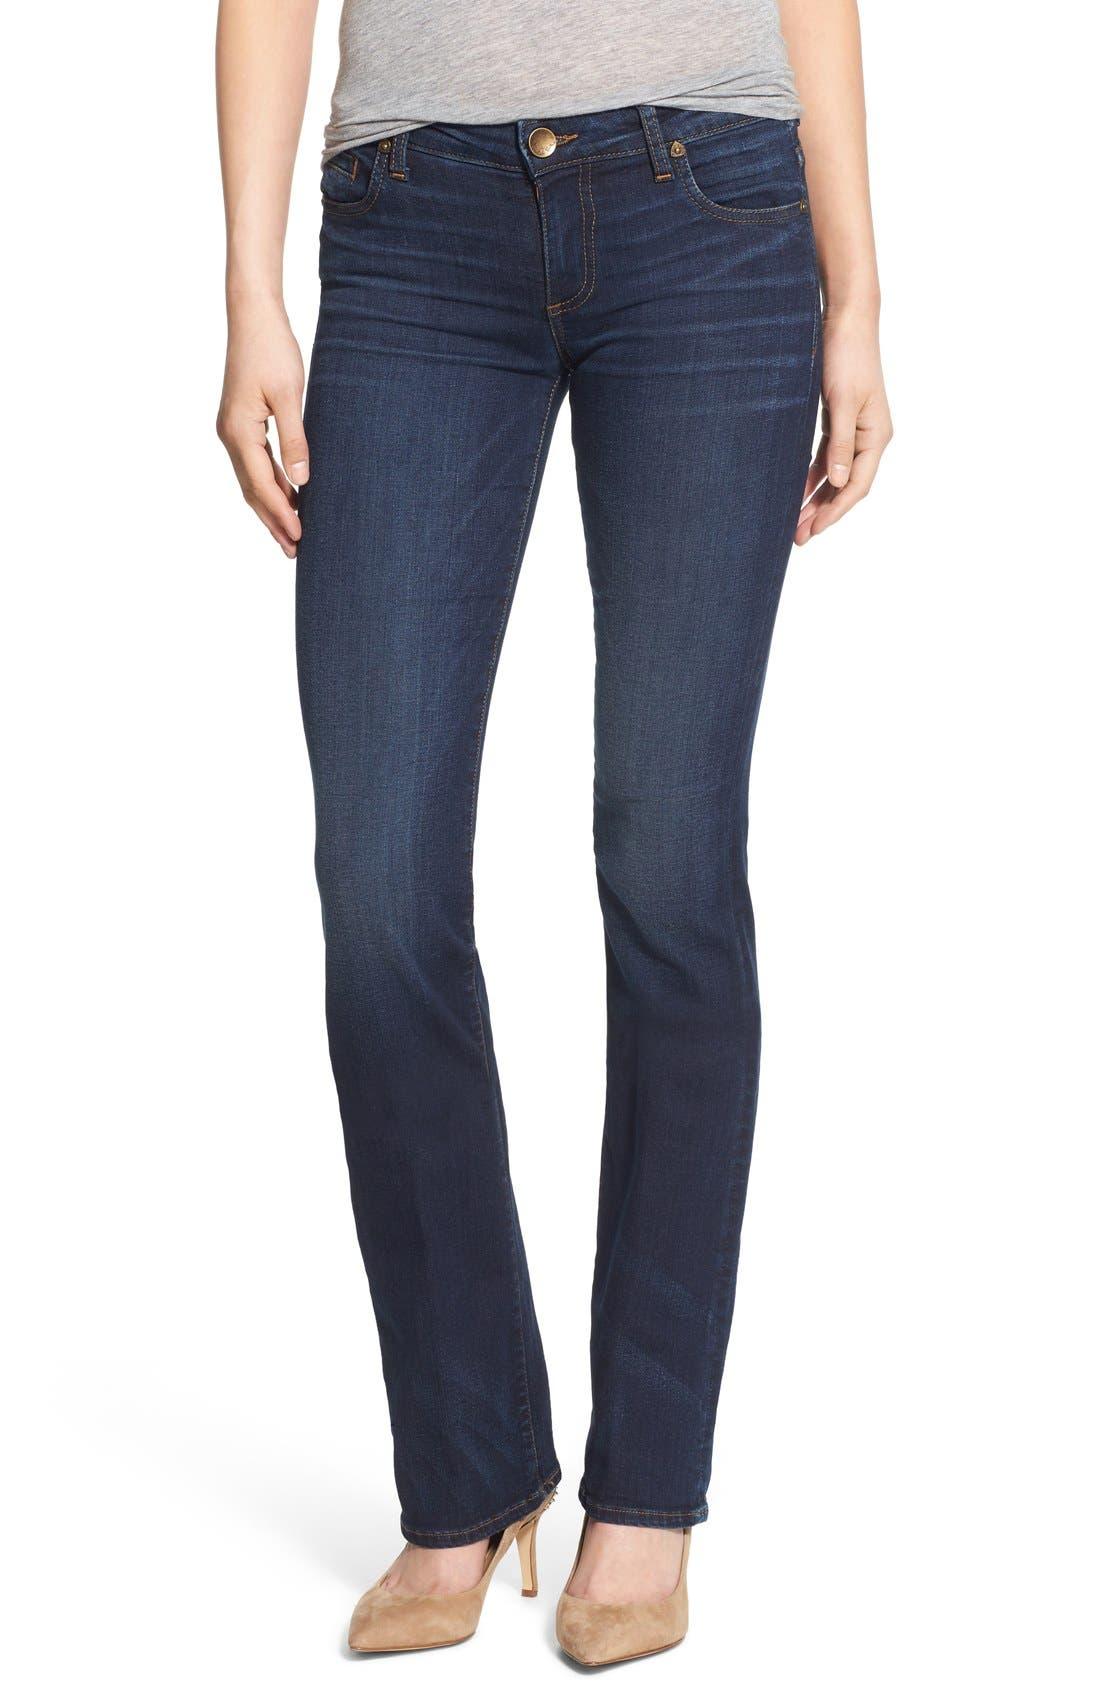 'Natalie' Stretch Bootleg Jeans,                         Main,                         color, Closeness